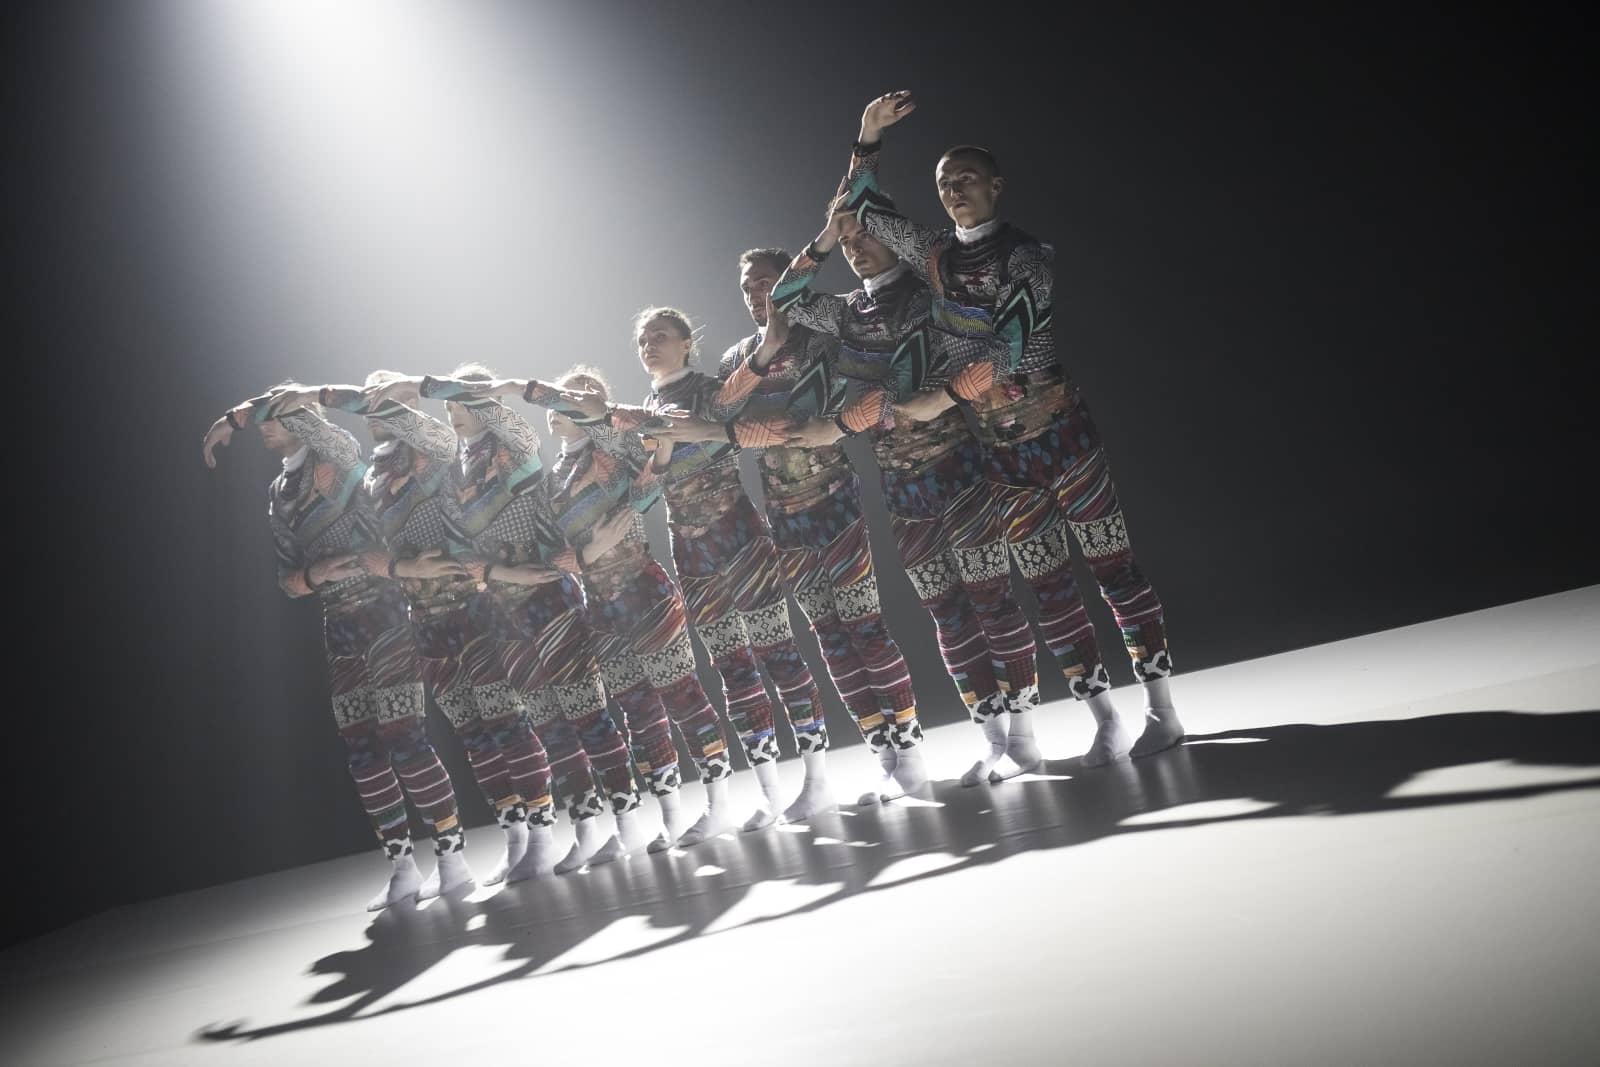 TUNDRA, a dance by Spanish guest choreographer Marcos Morau